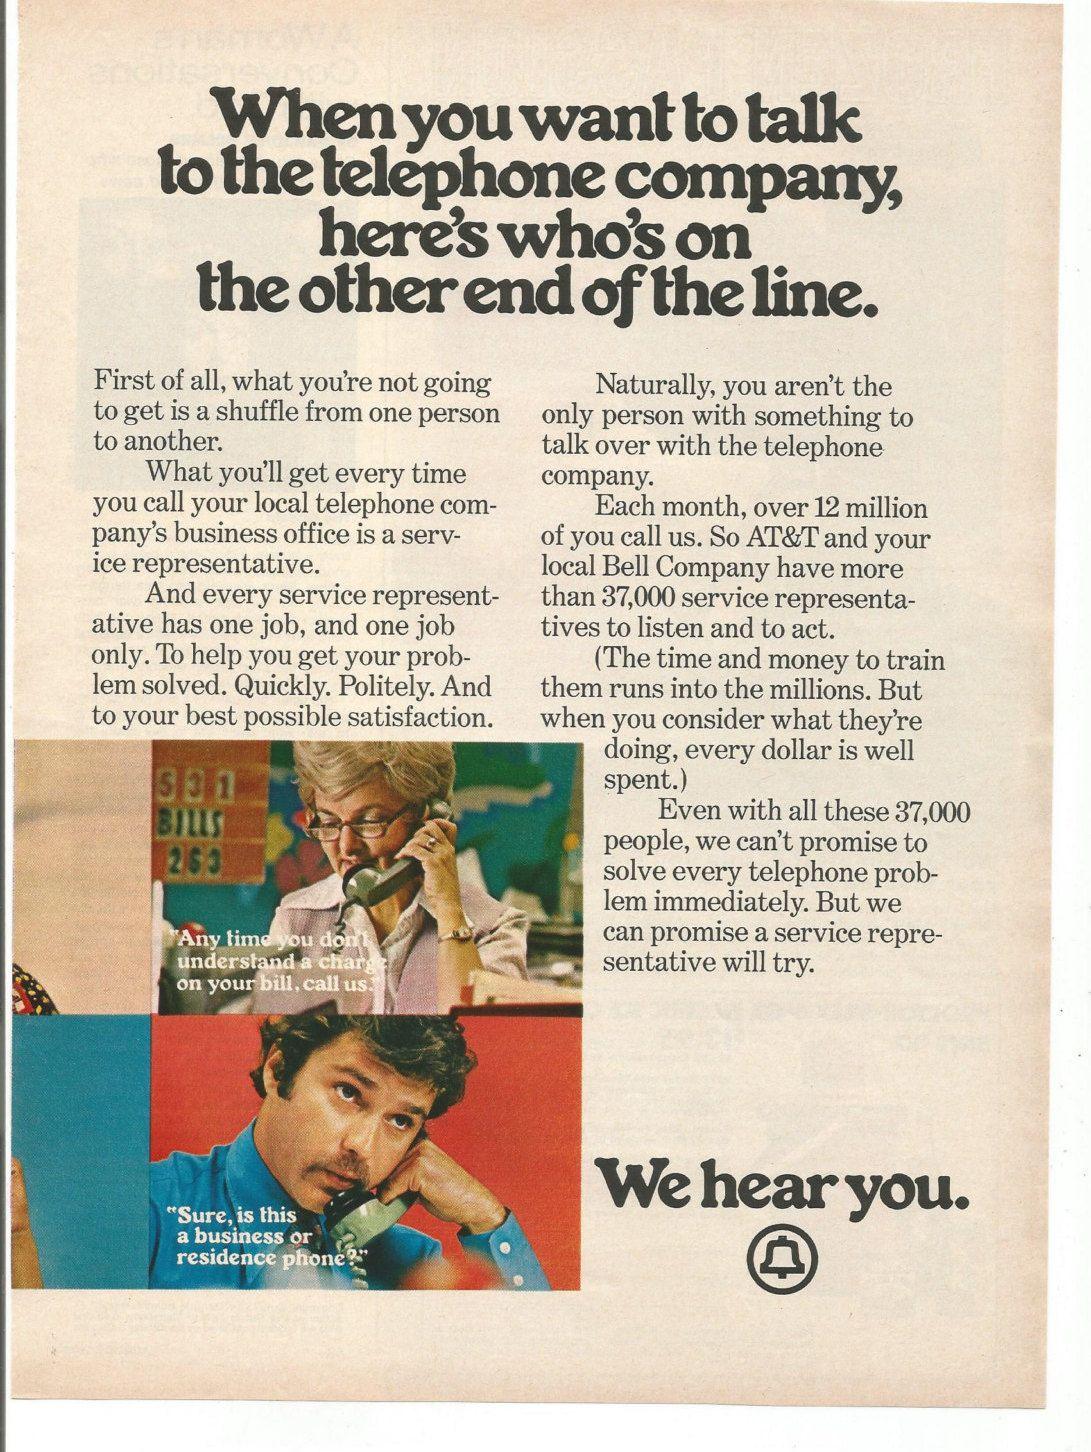 Customer Service vintage description. 1973 Advertisement